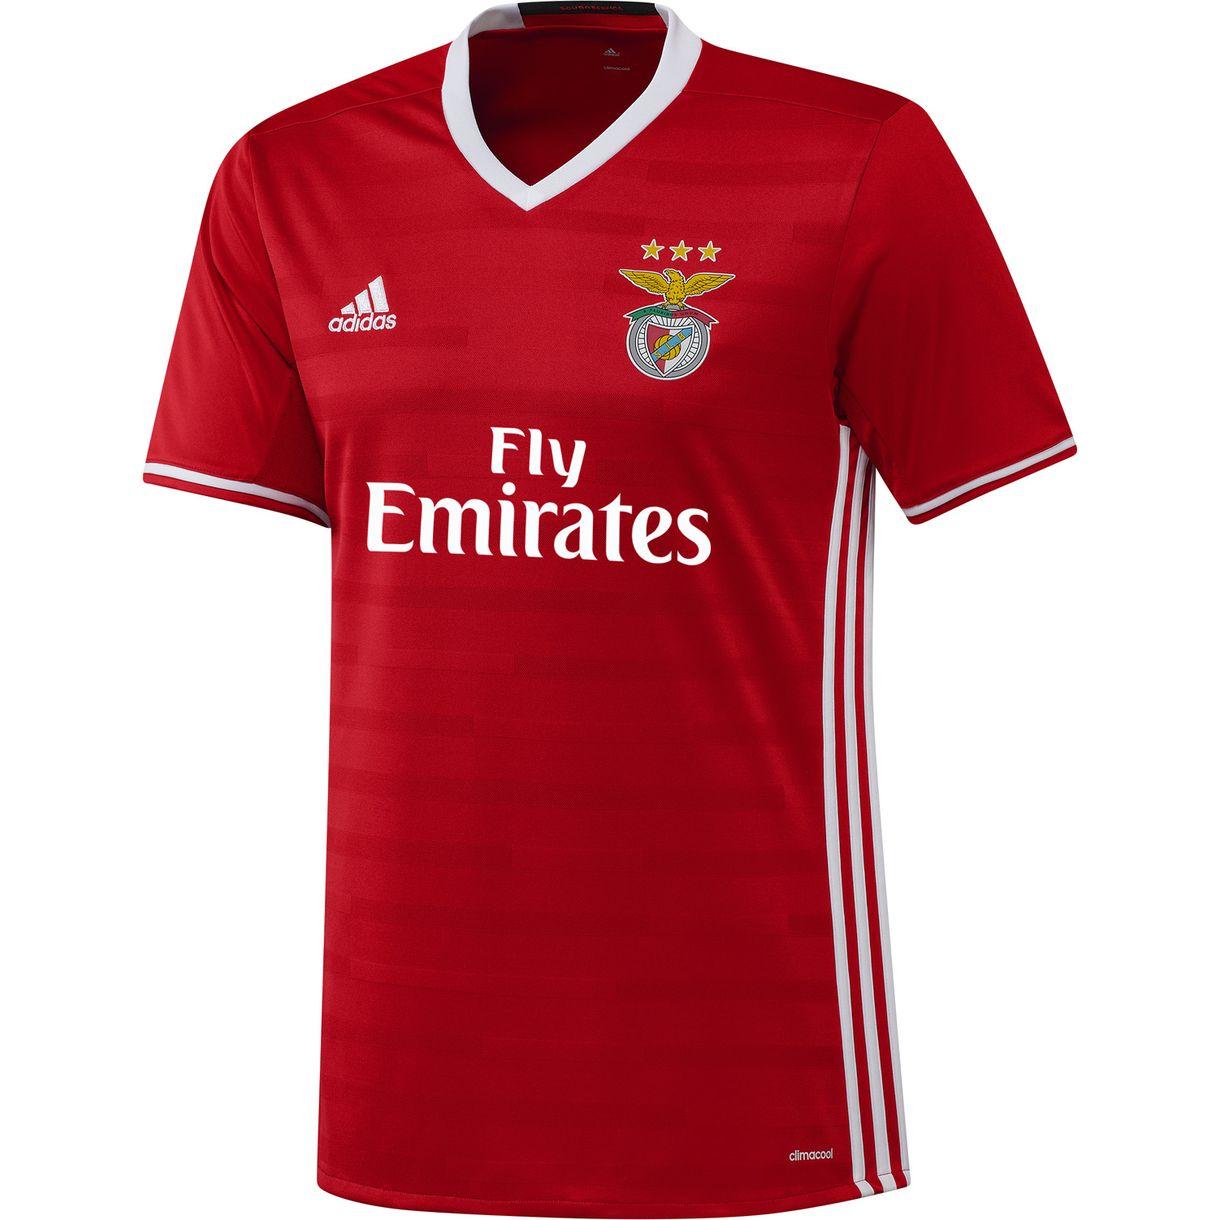 84318db37aa 2016-2017 Benfica Adidas Home Football Shirt